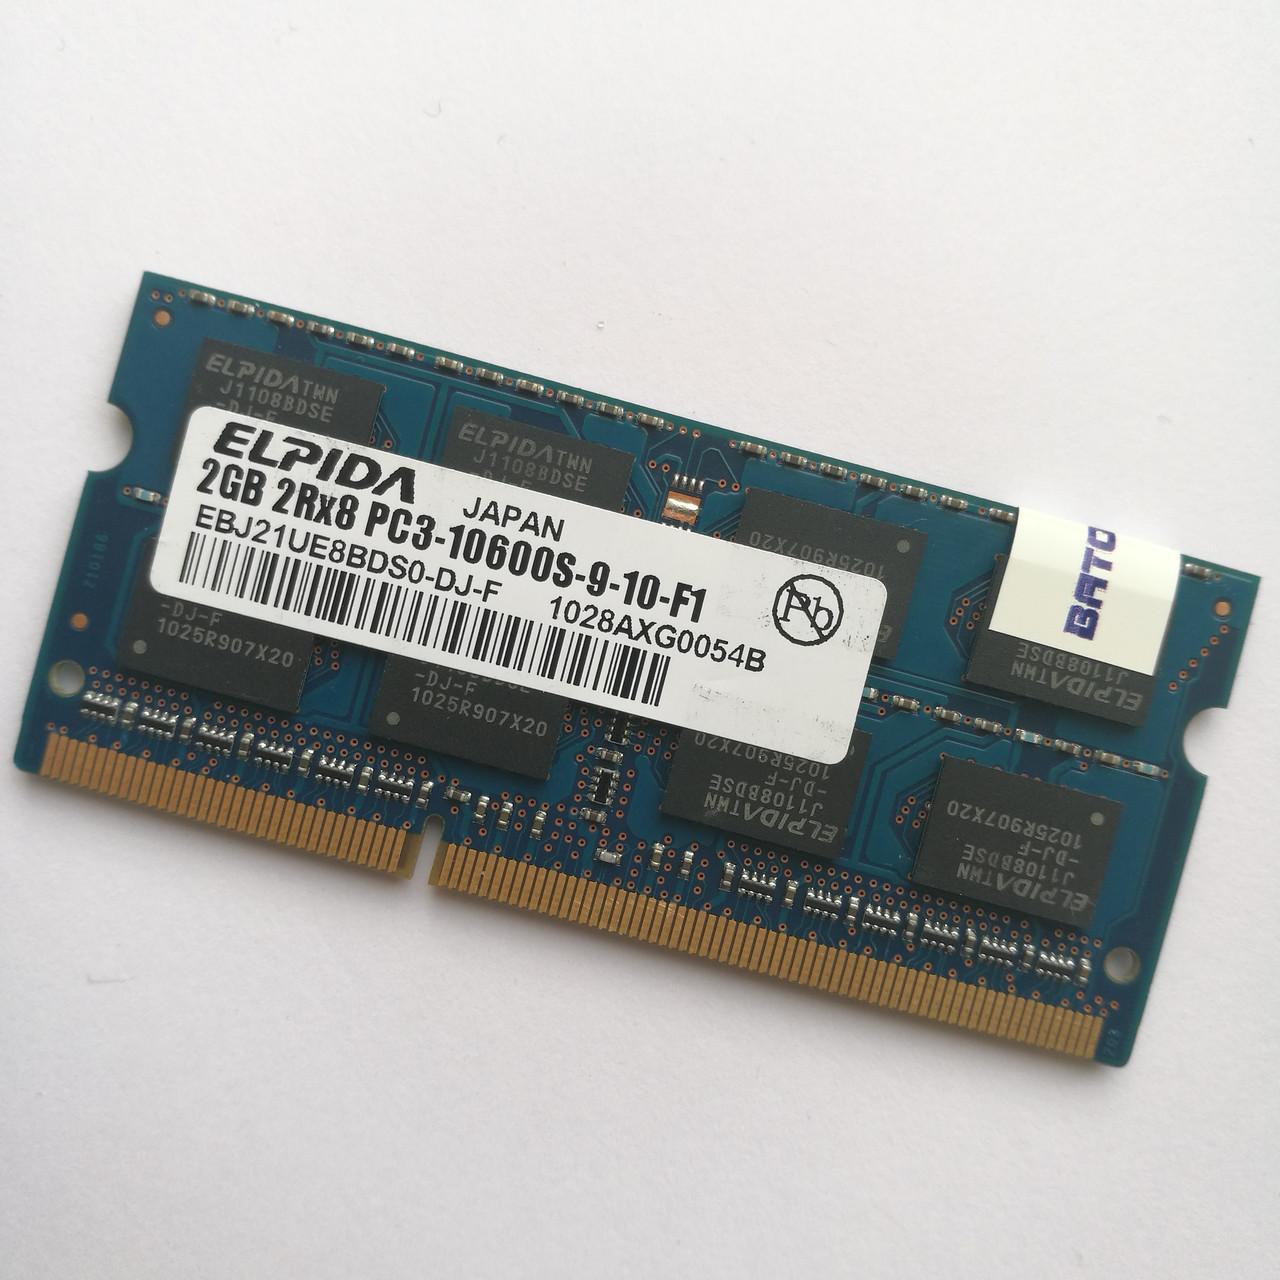 Оперативная память для ноутбука Elpida SODIMM DDR3 2Gb 1333MHz 10600s CL9 (EBJ21UE8BDSO-DJ-F) Б/У